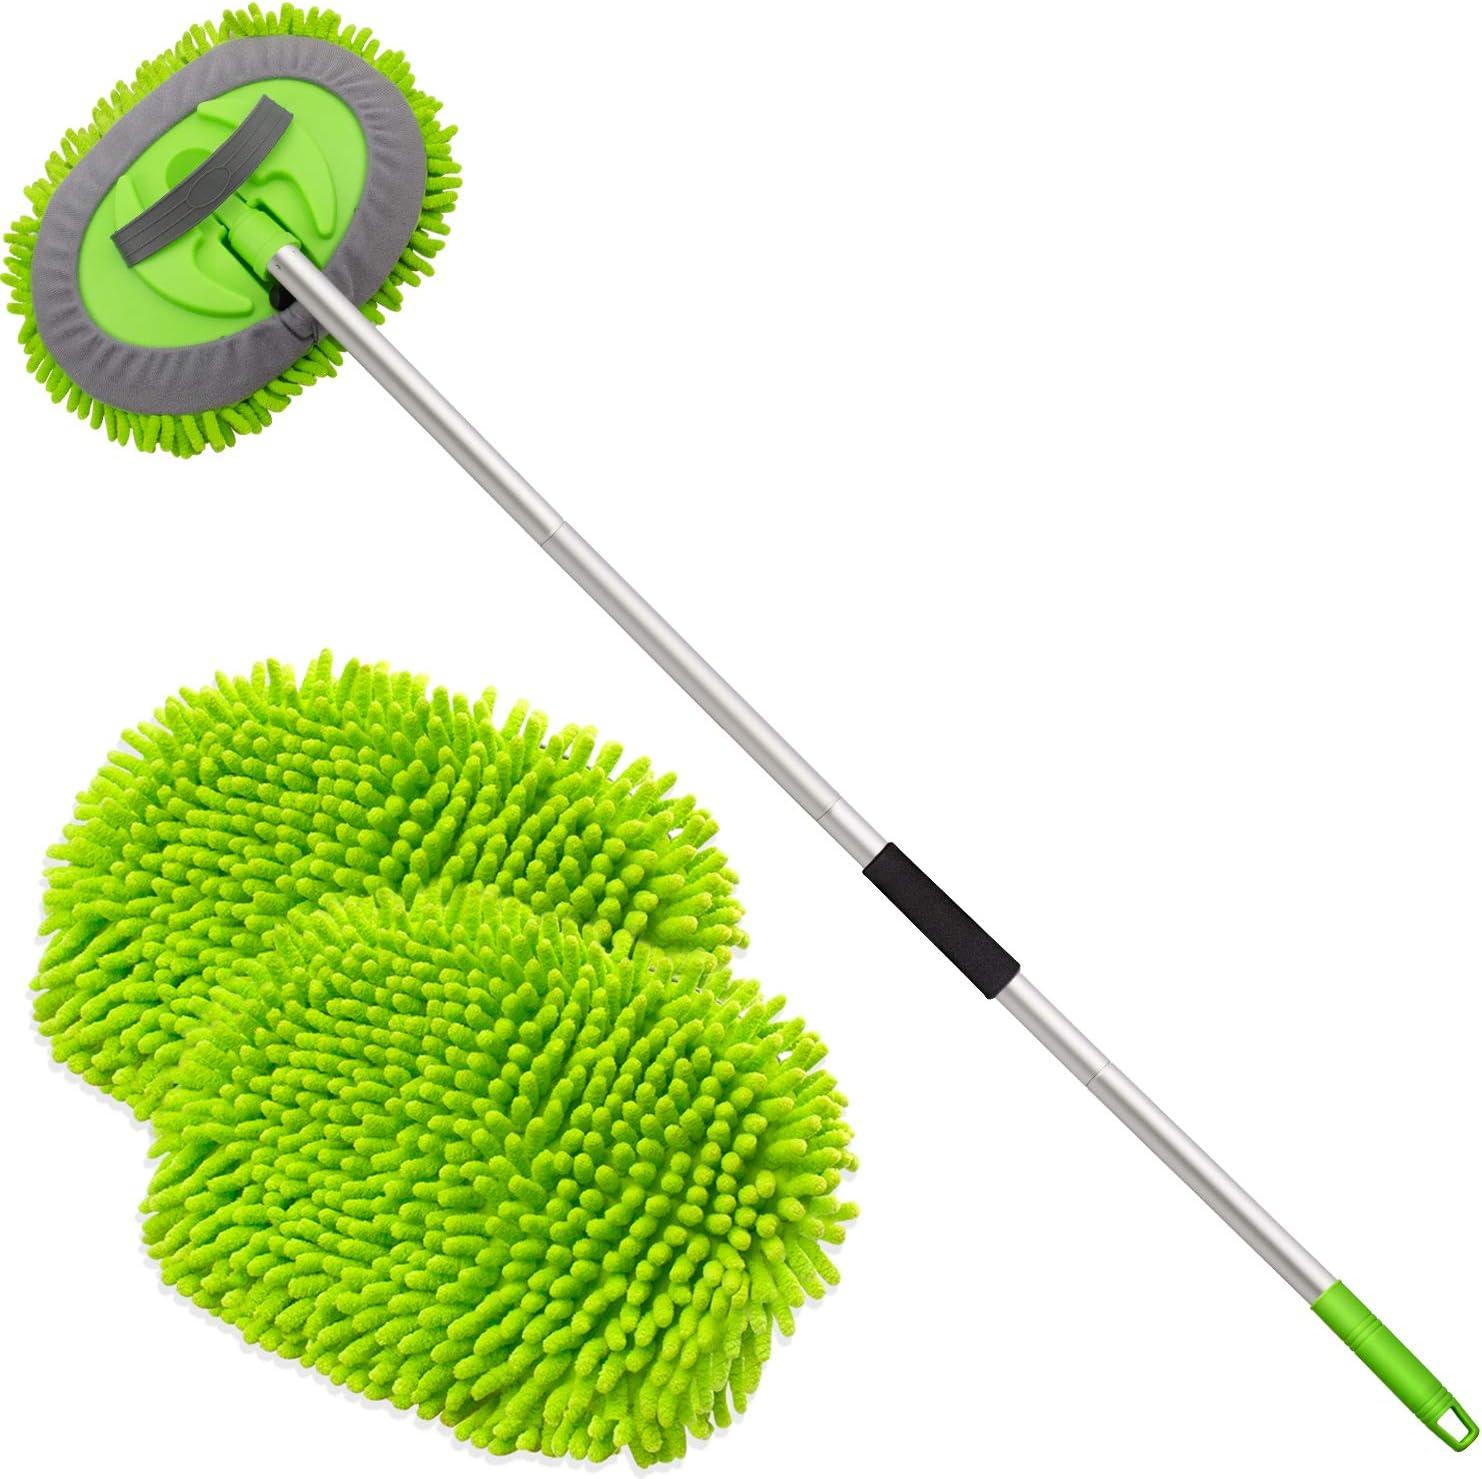 "Anngrowy 62"" Microfiber Car Wash Brush Mop Kit $17.84 Coupon"